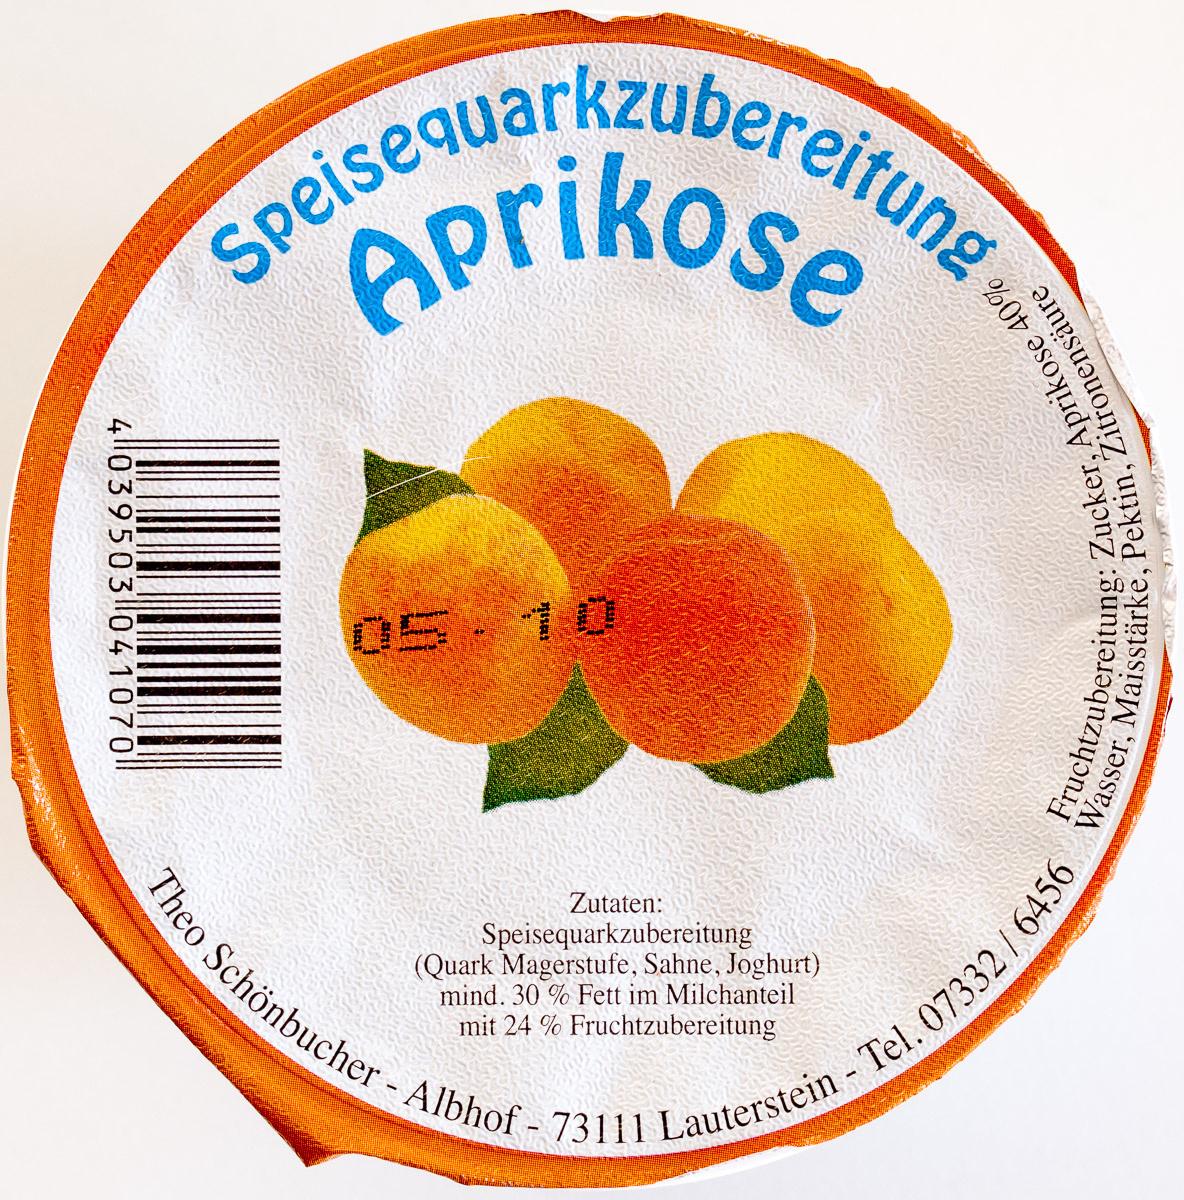 Speisequarkzubereitung Aprikose - Produit